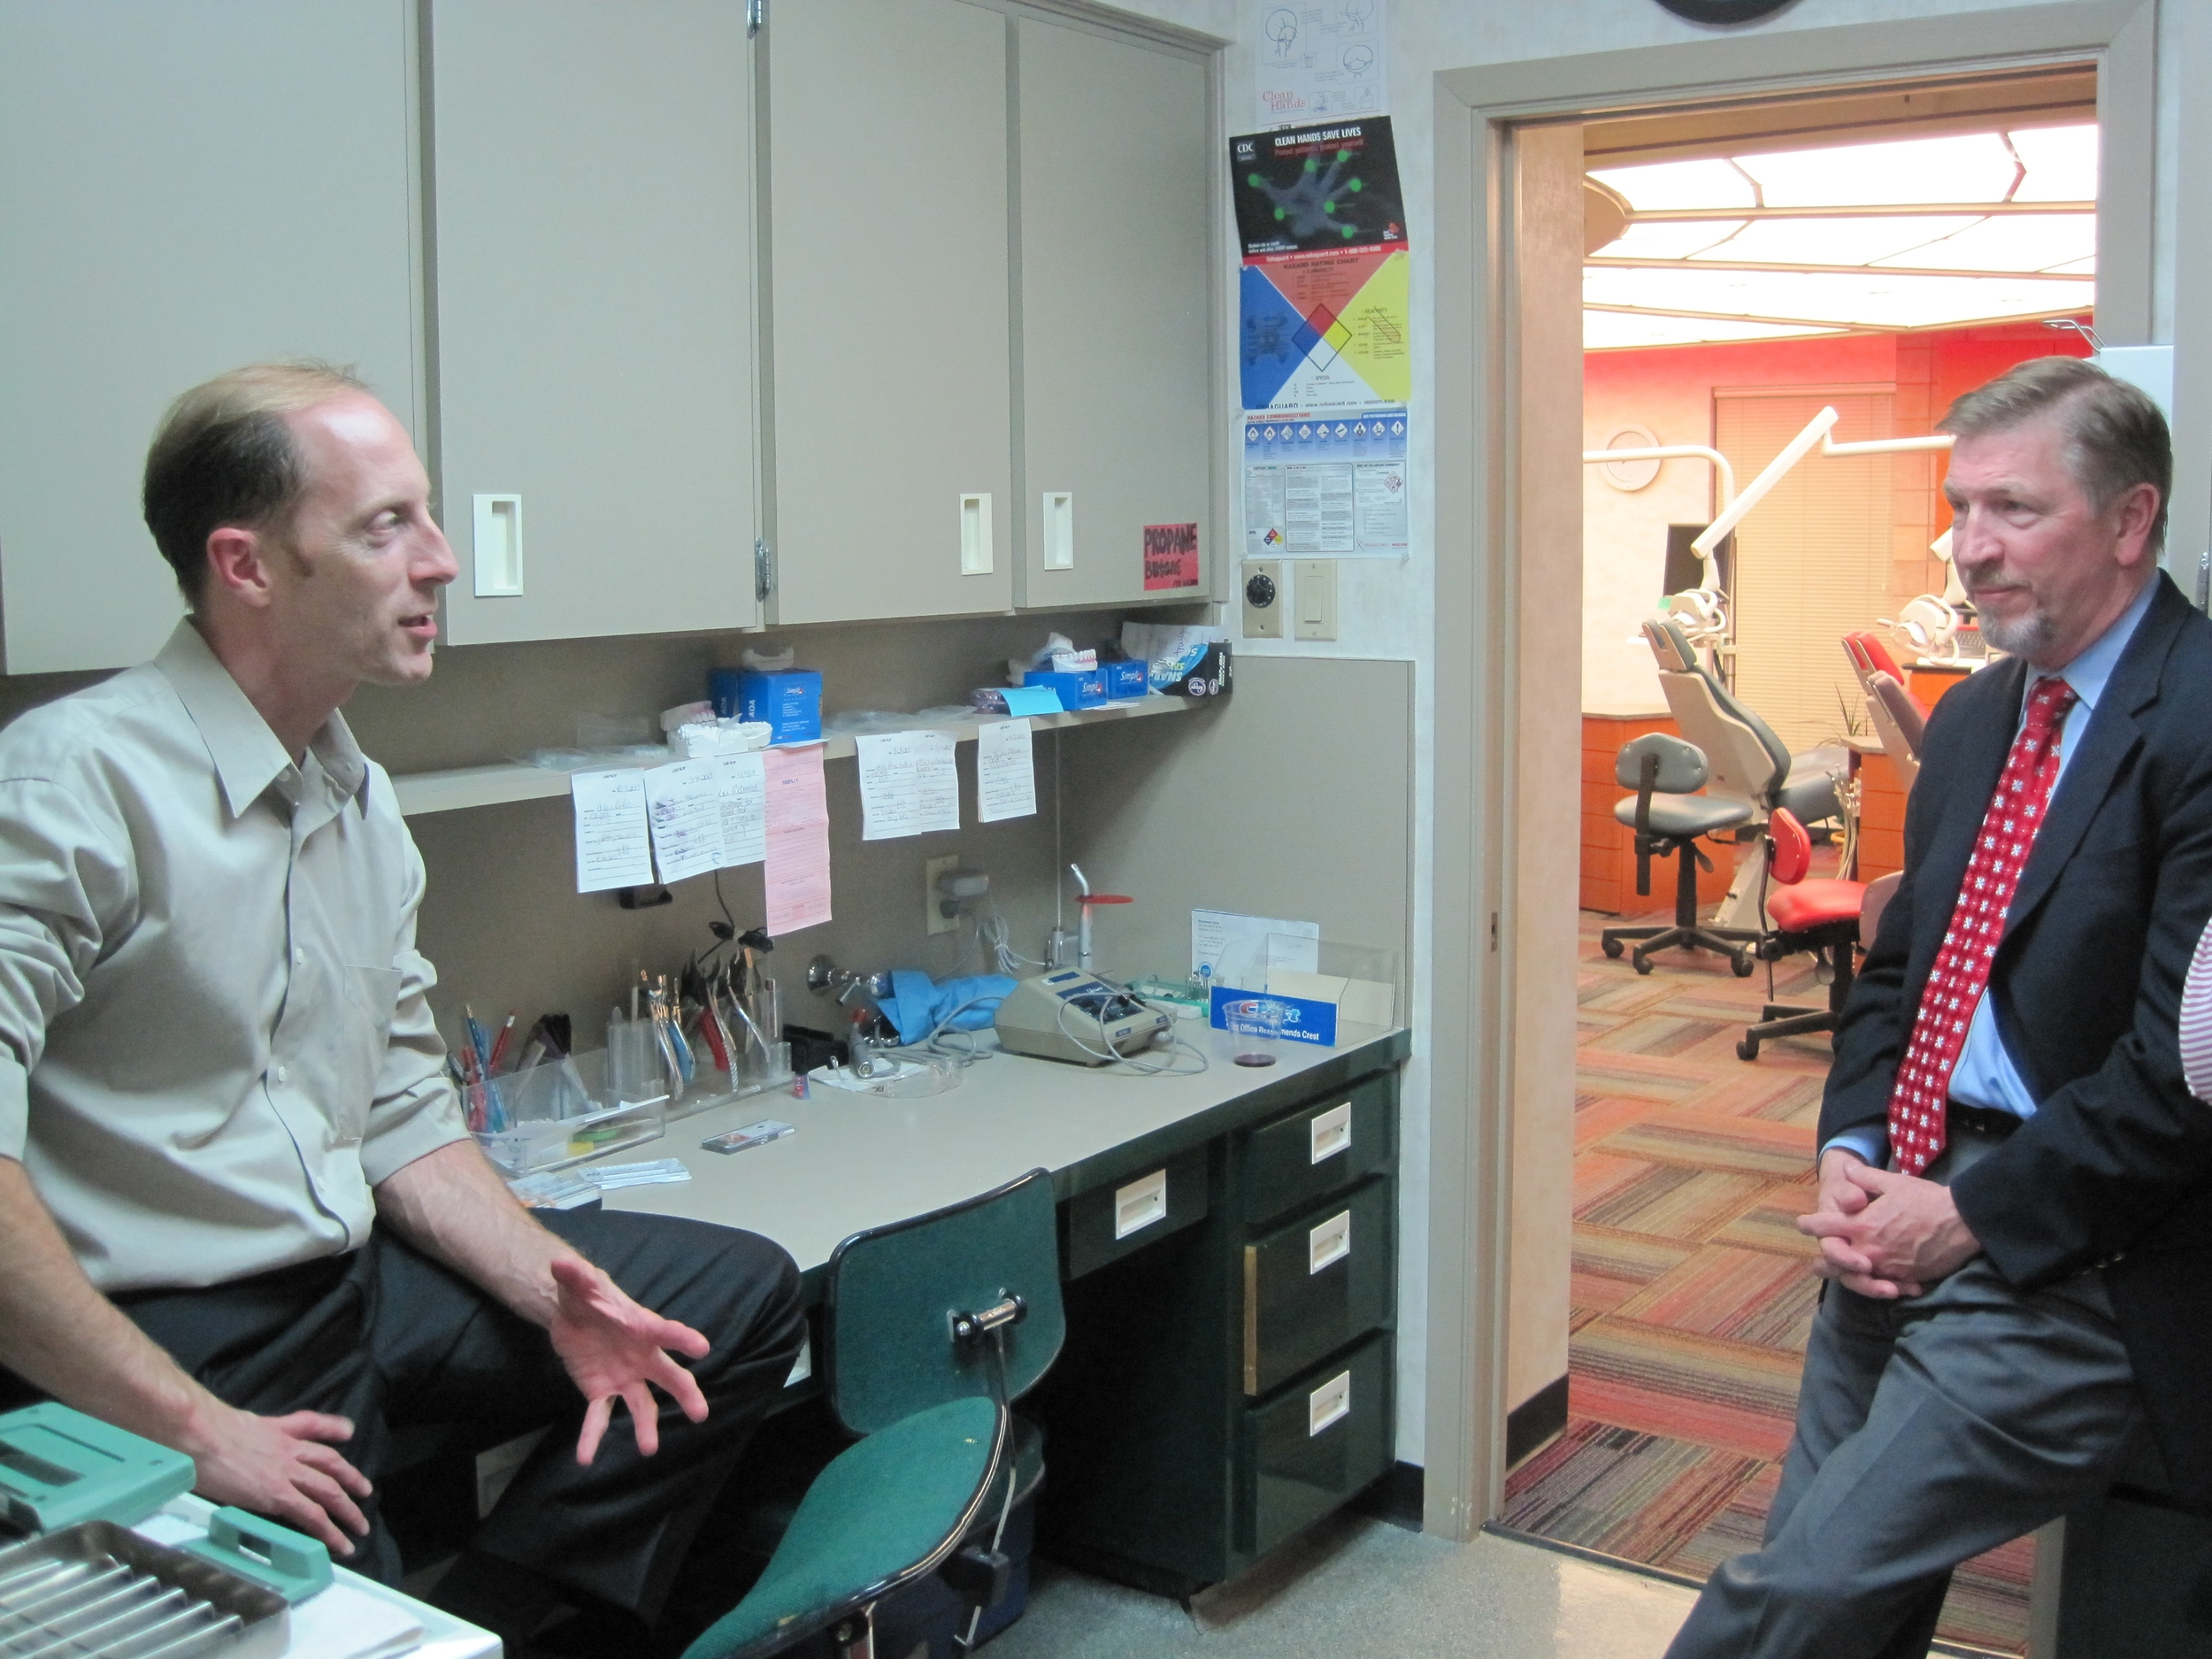 Drs. Doug Jensen and Larry Tadlock